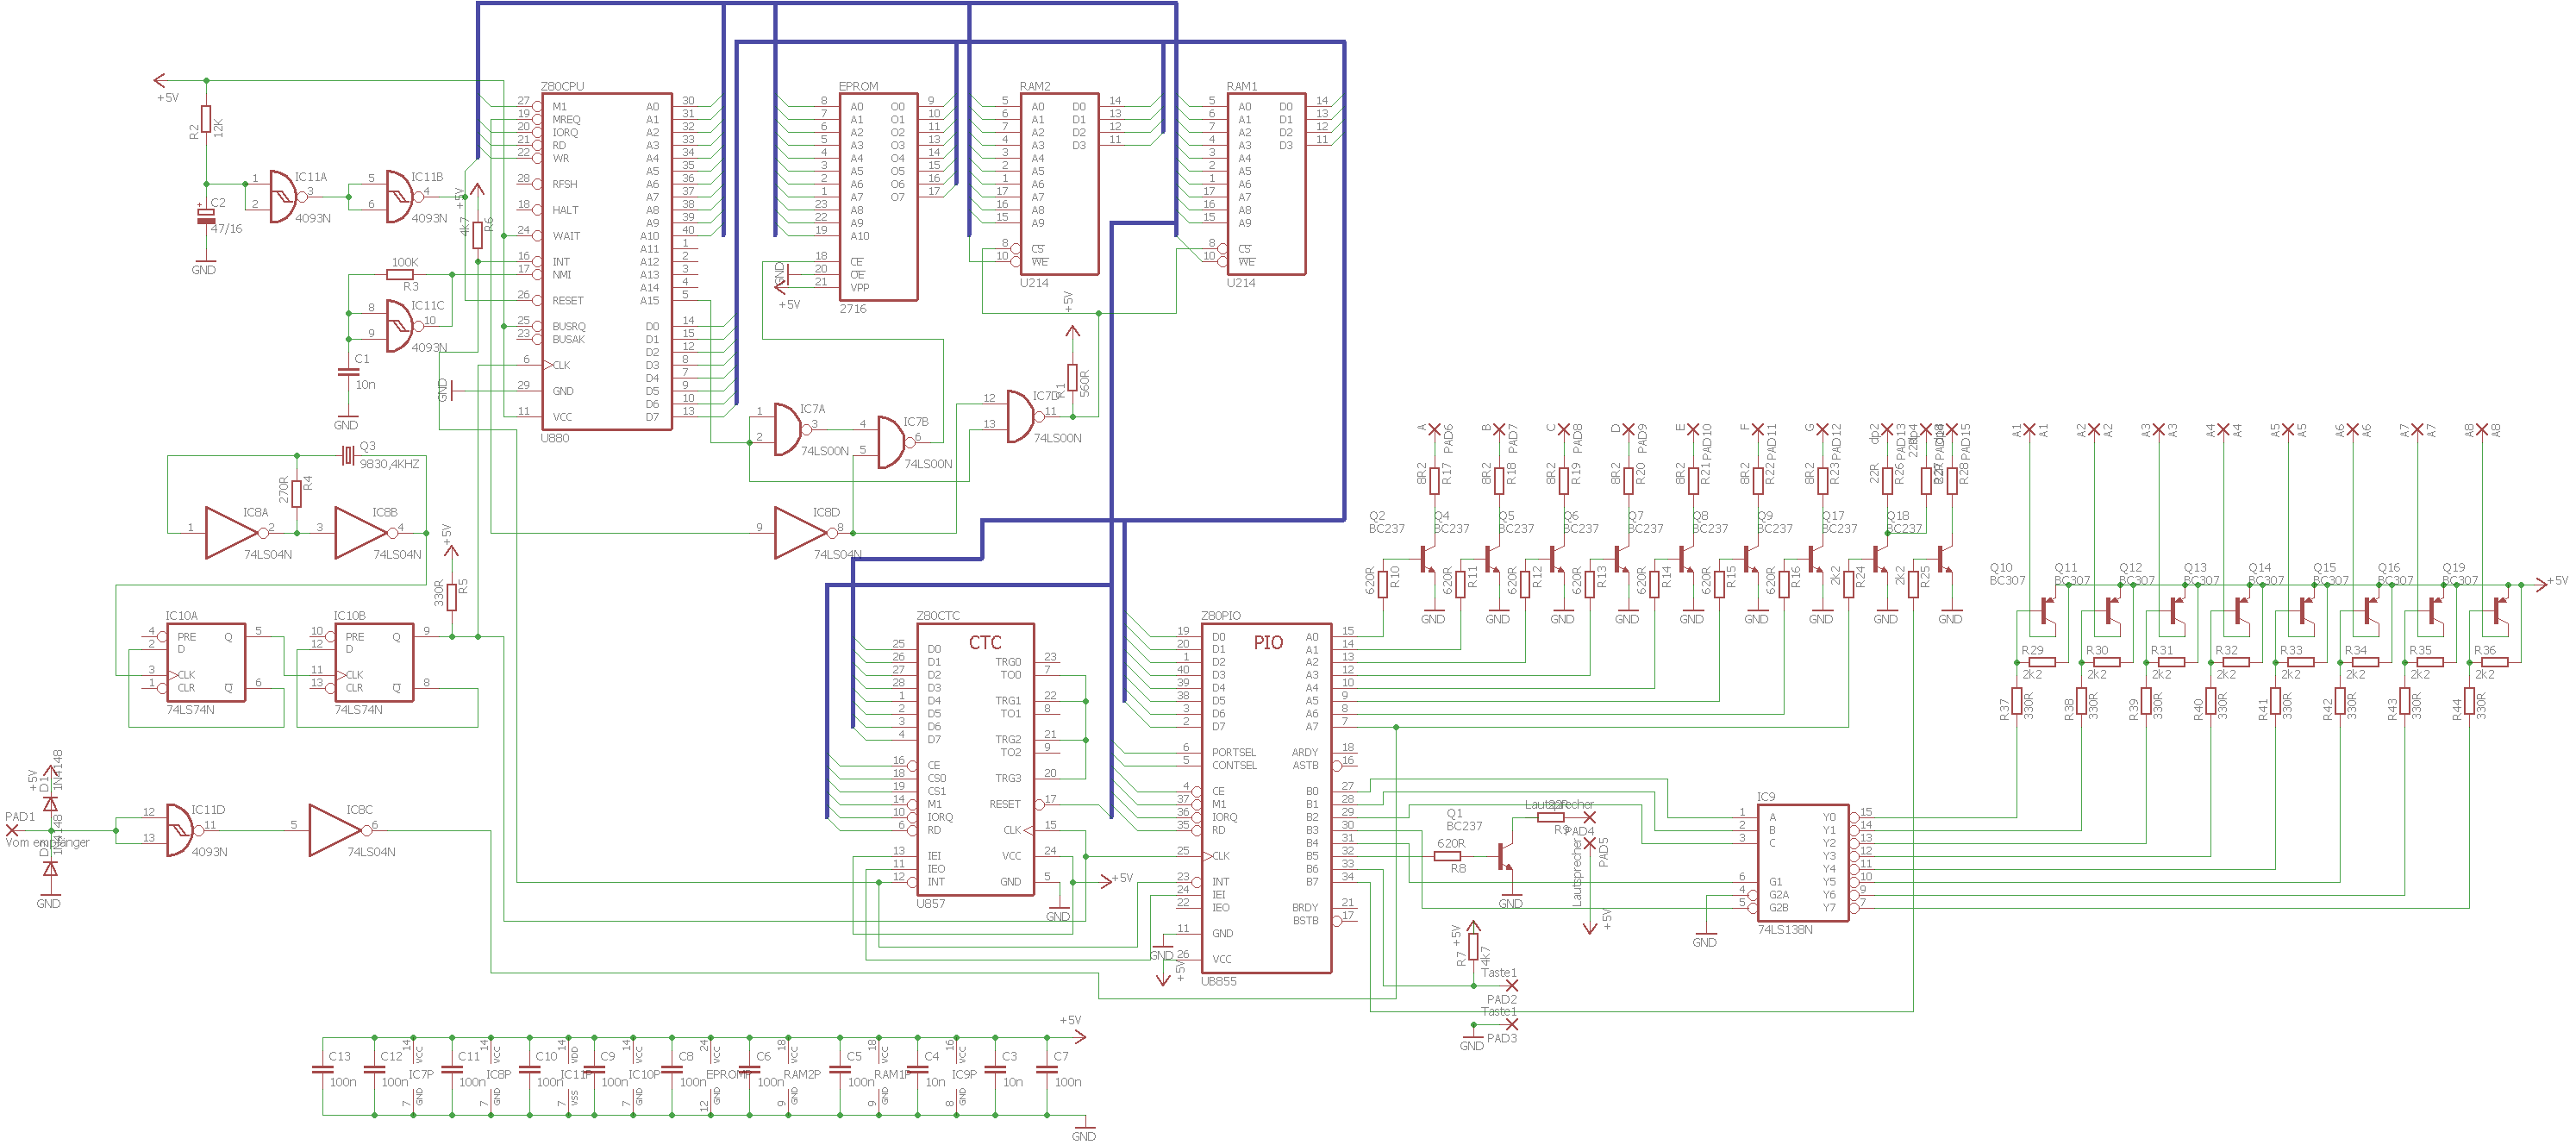 Funkuhr mit Mikroprozessor FA 5/86 - Mikrocontroller.net